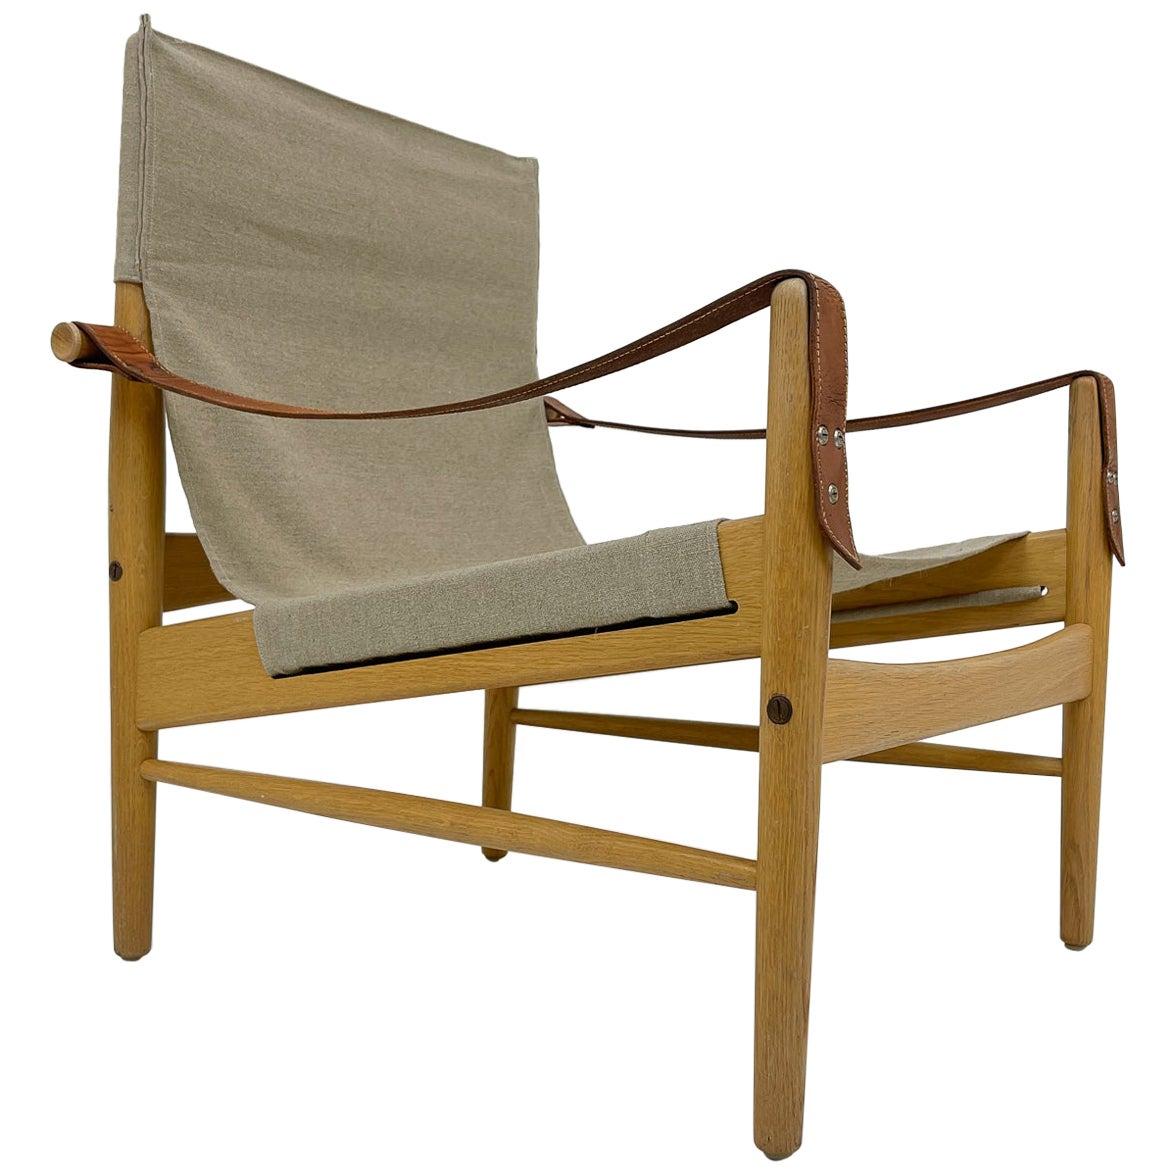 Midcentury Hans Olsen 'Gazelle' Safari Lounge Chair, 1960s